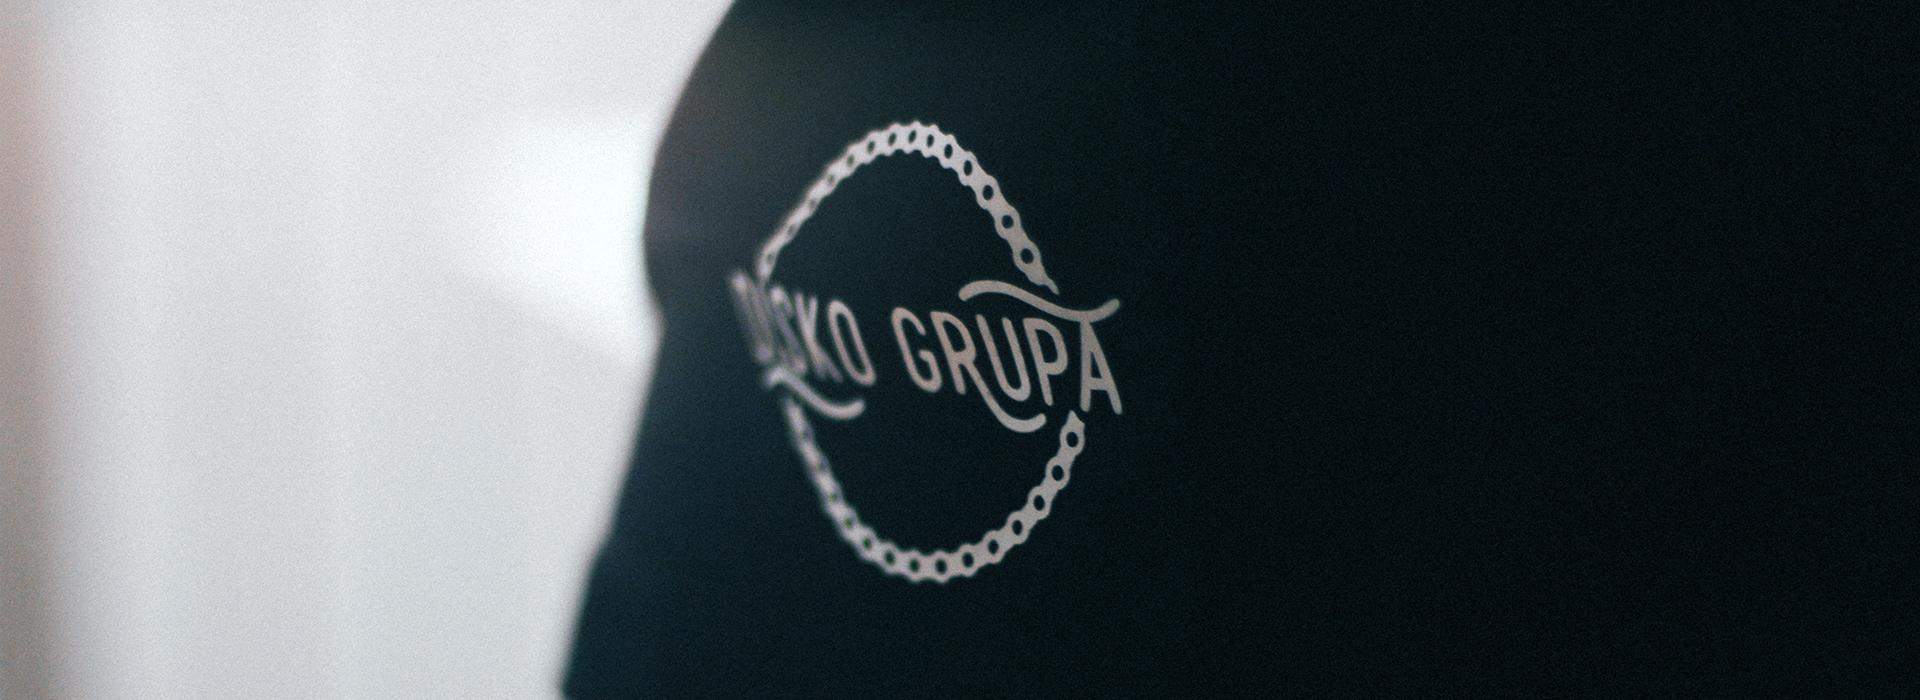 Disko_grupa_giro_header-4